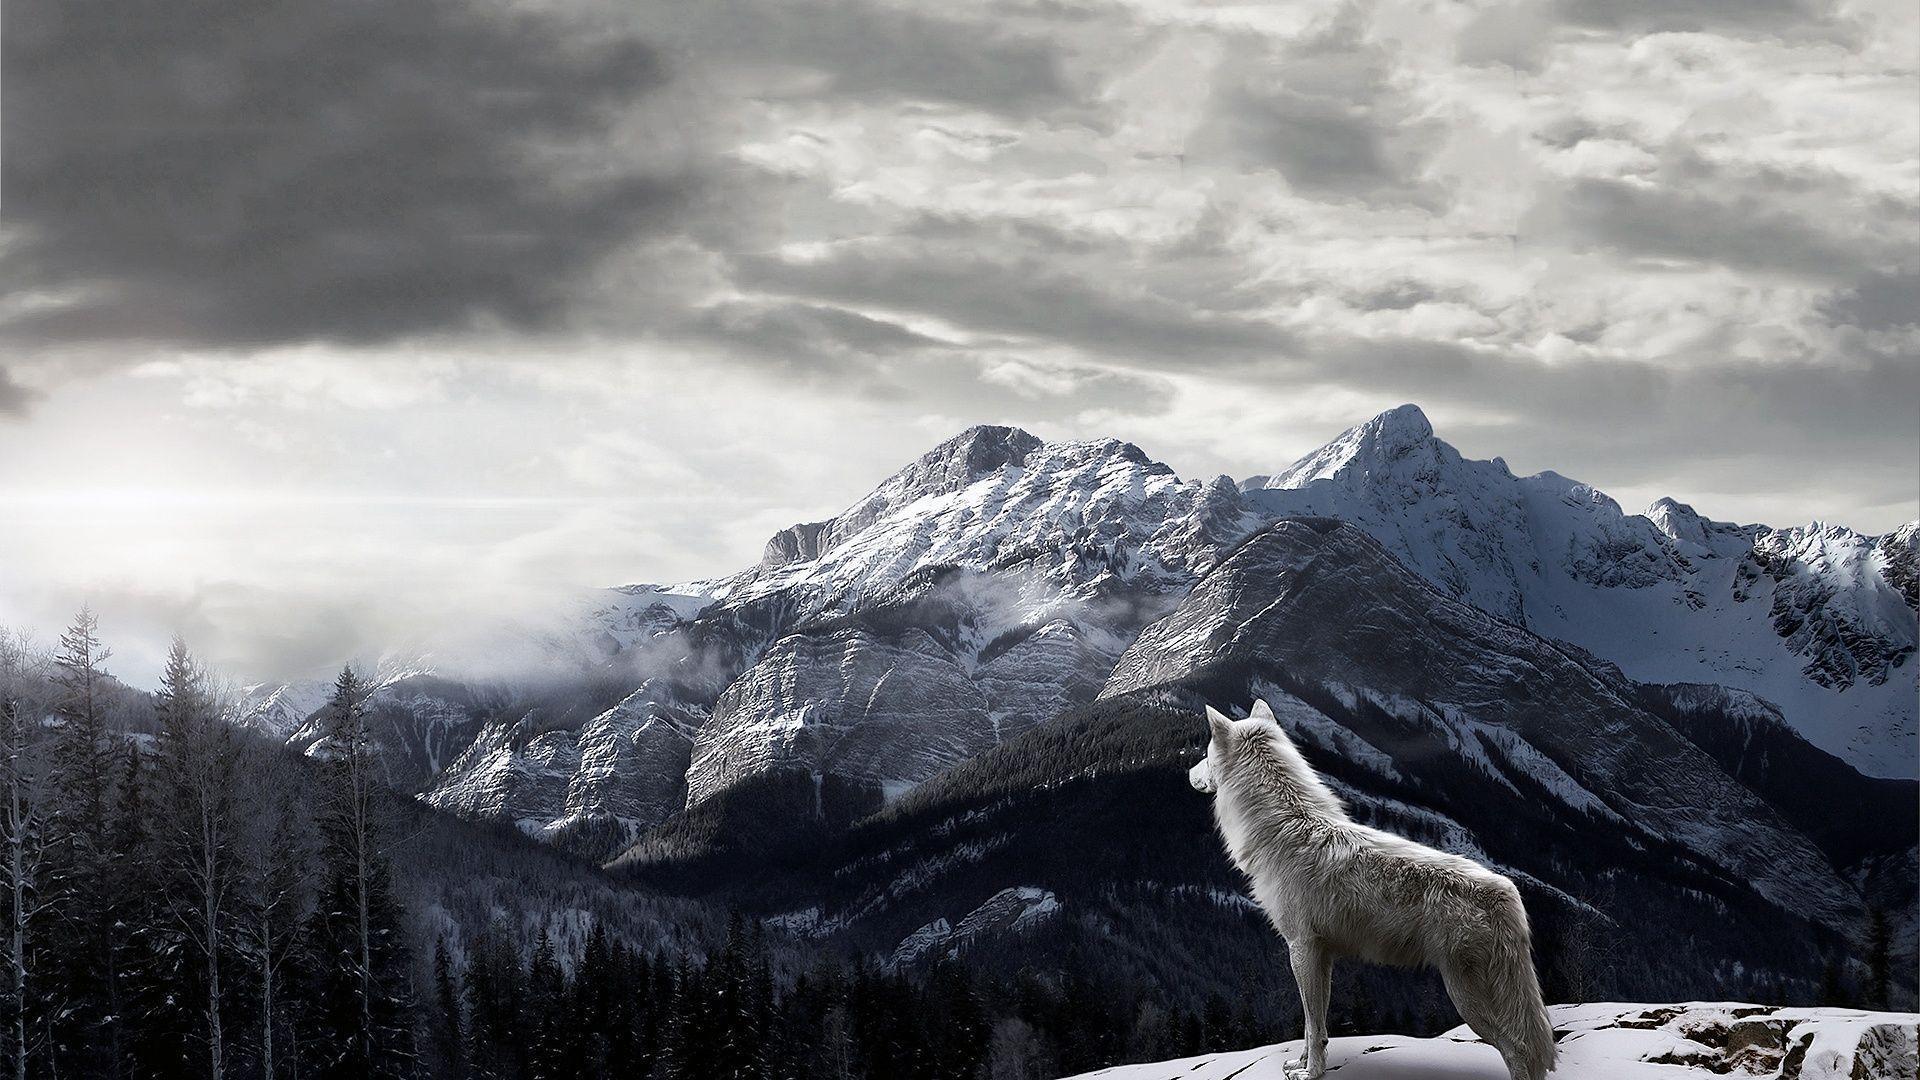 Full HD p Wolf Wallpapers Desktop Images k Free Download rh